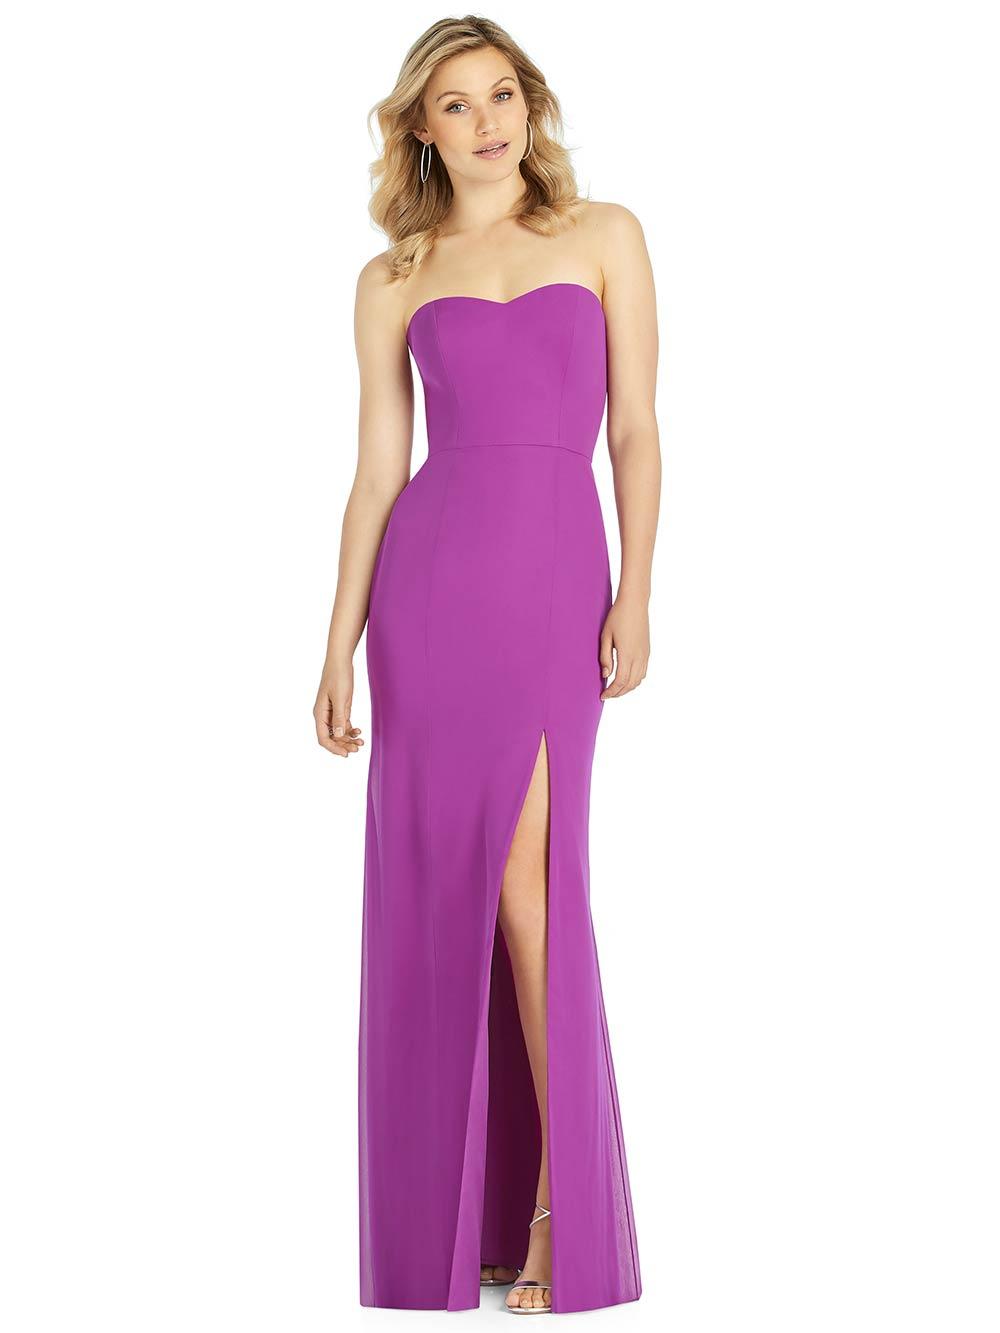 bridesmaid-dresses-dessy-27508